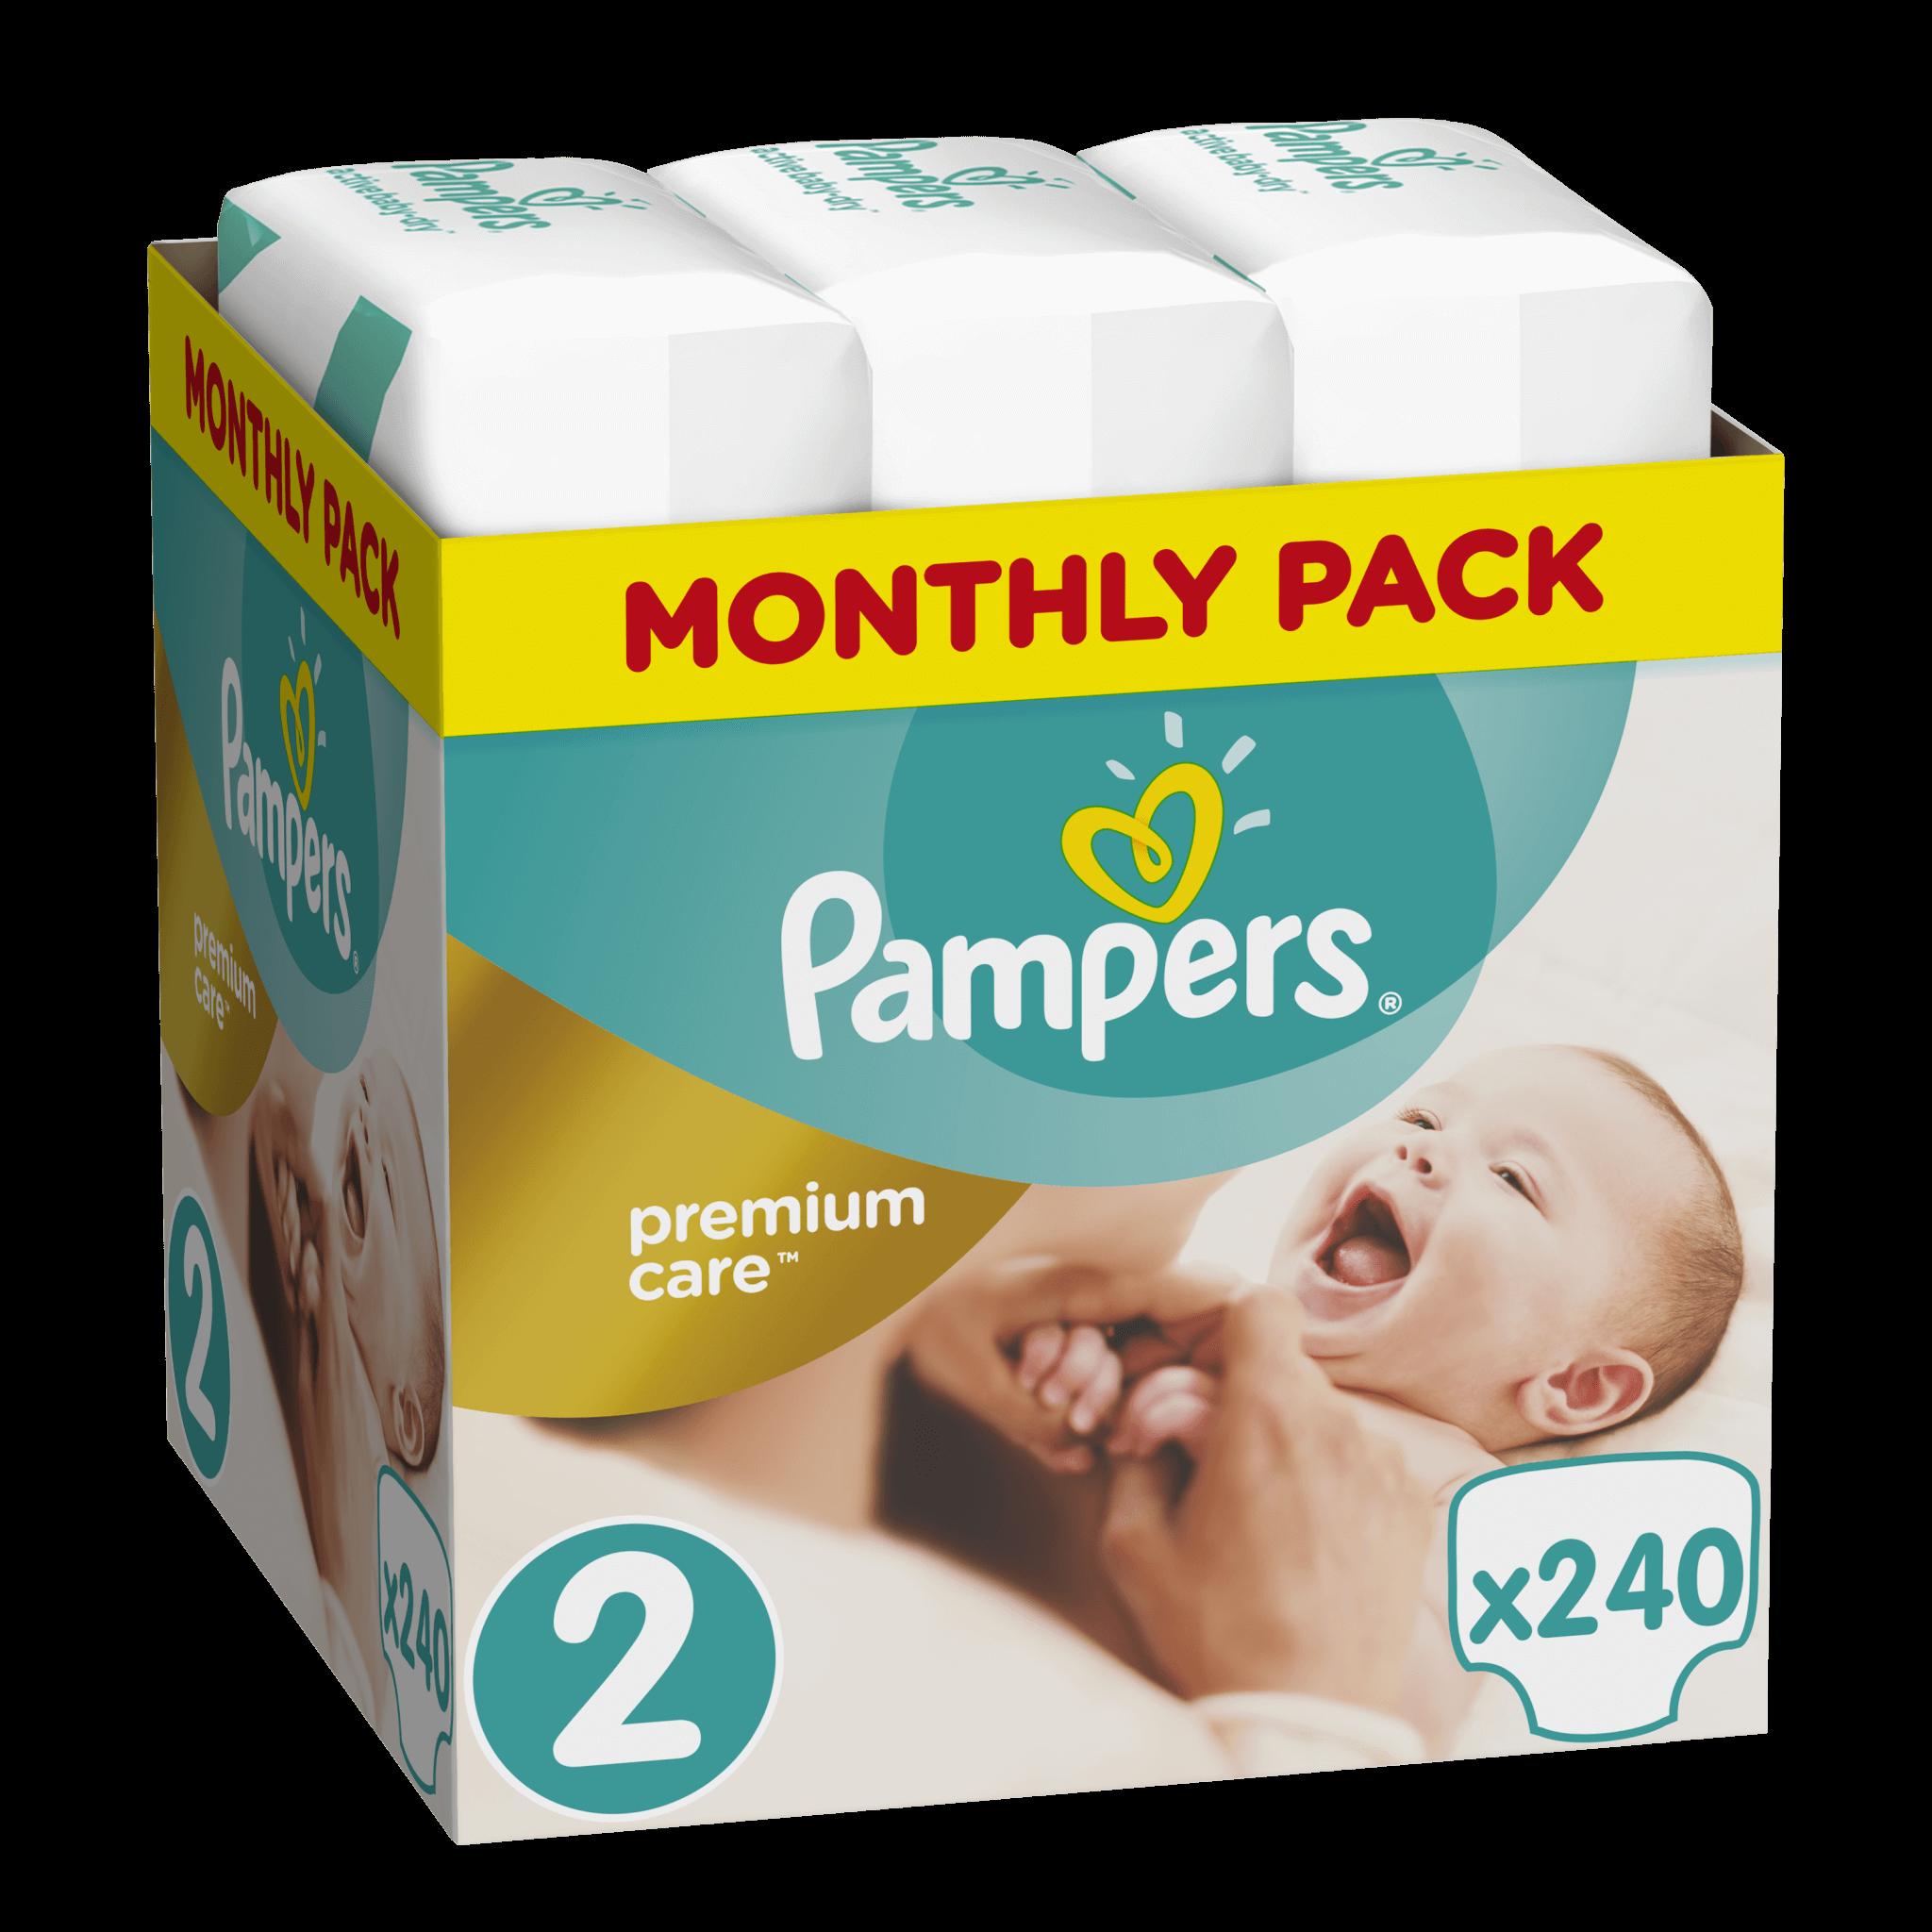 PampersPremium CareMonthly Pack No2 (3-6kg)240 πάνες, μόνο 0,17€ / πάνα μητέρα παιδί   περιποίηση για το μωρό   πάνες για το μωρό